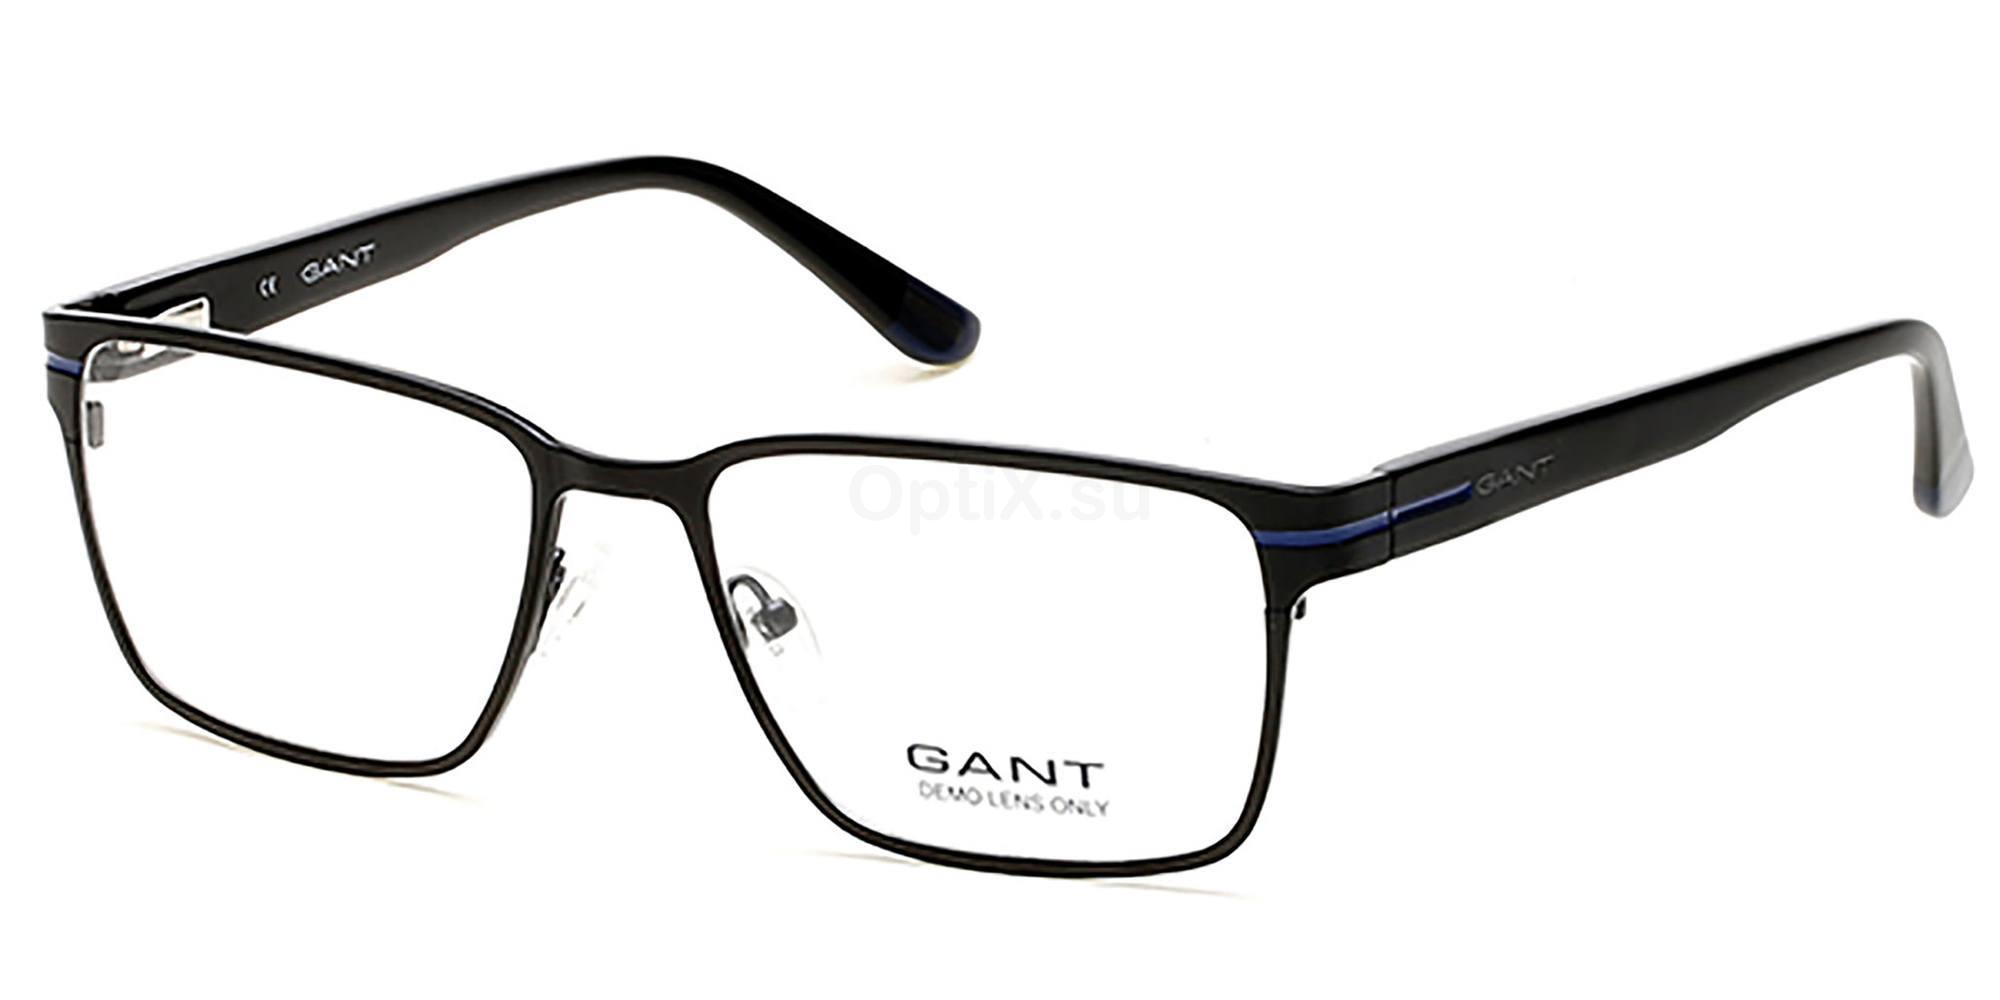 002 GA3104 , Gant